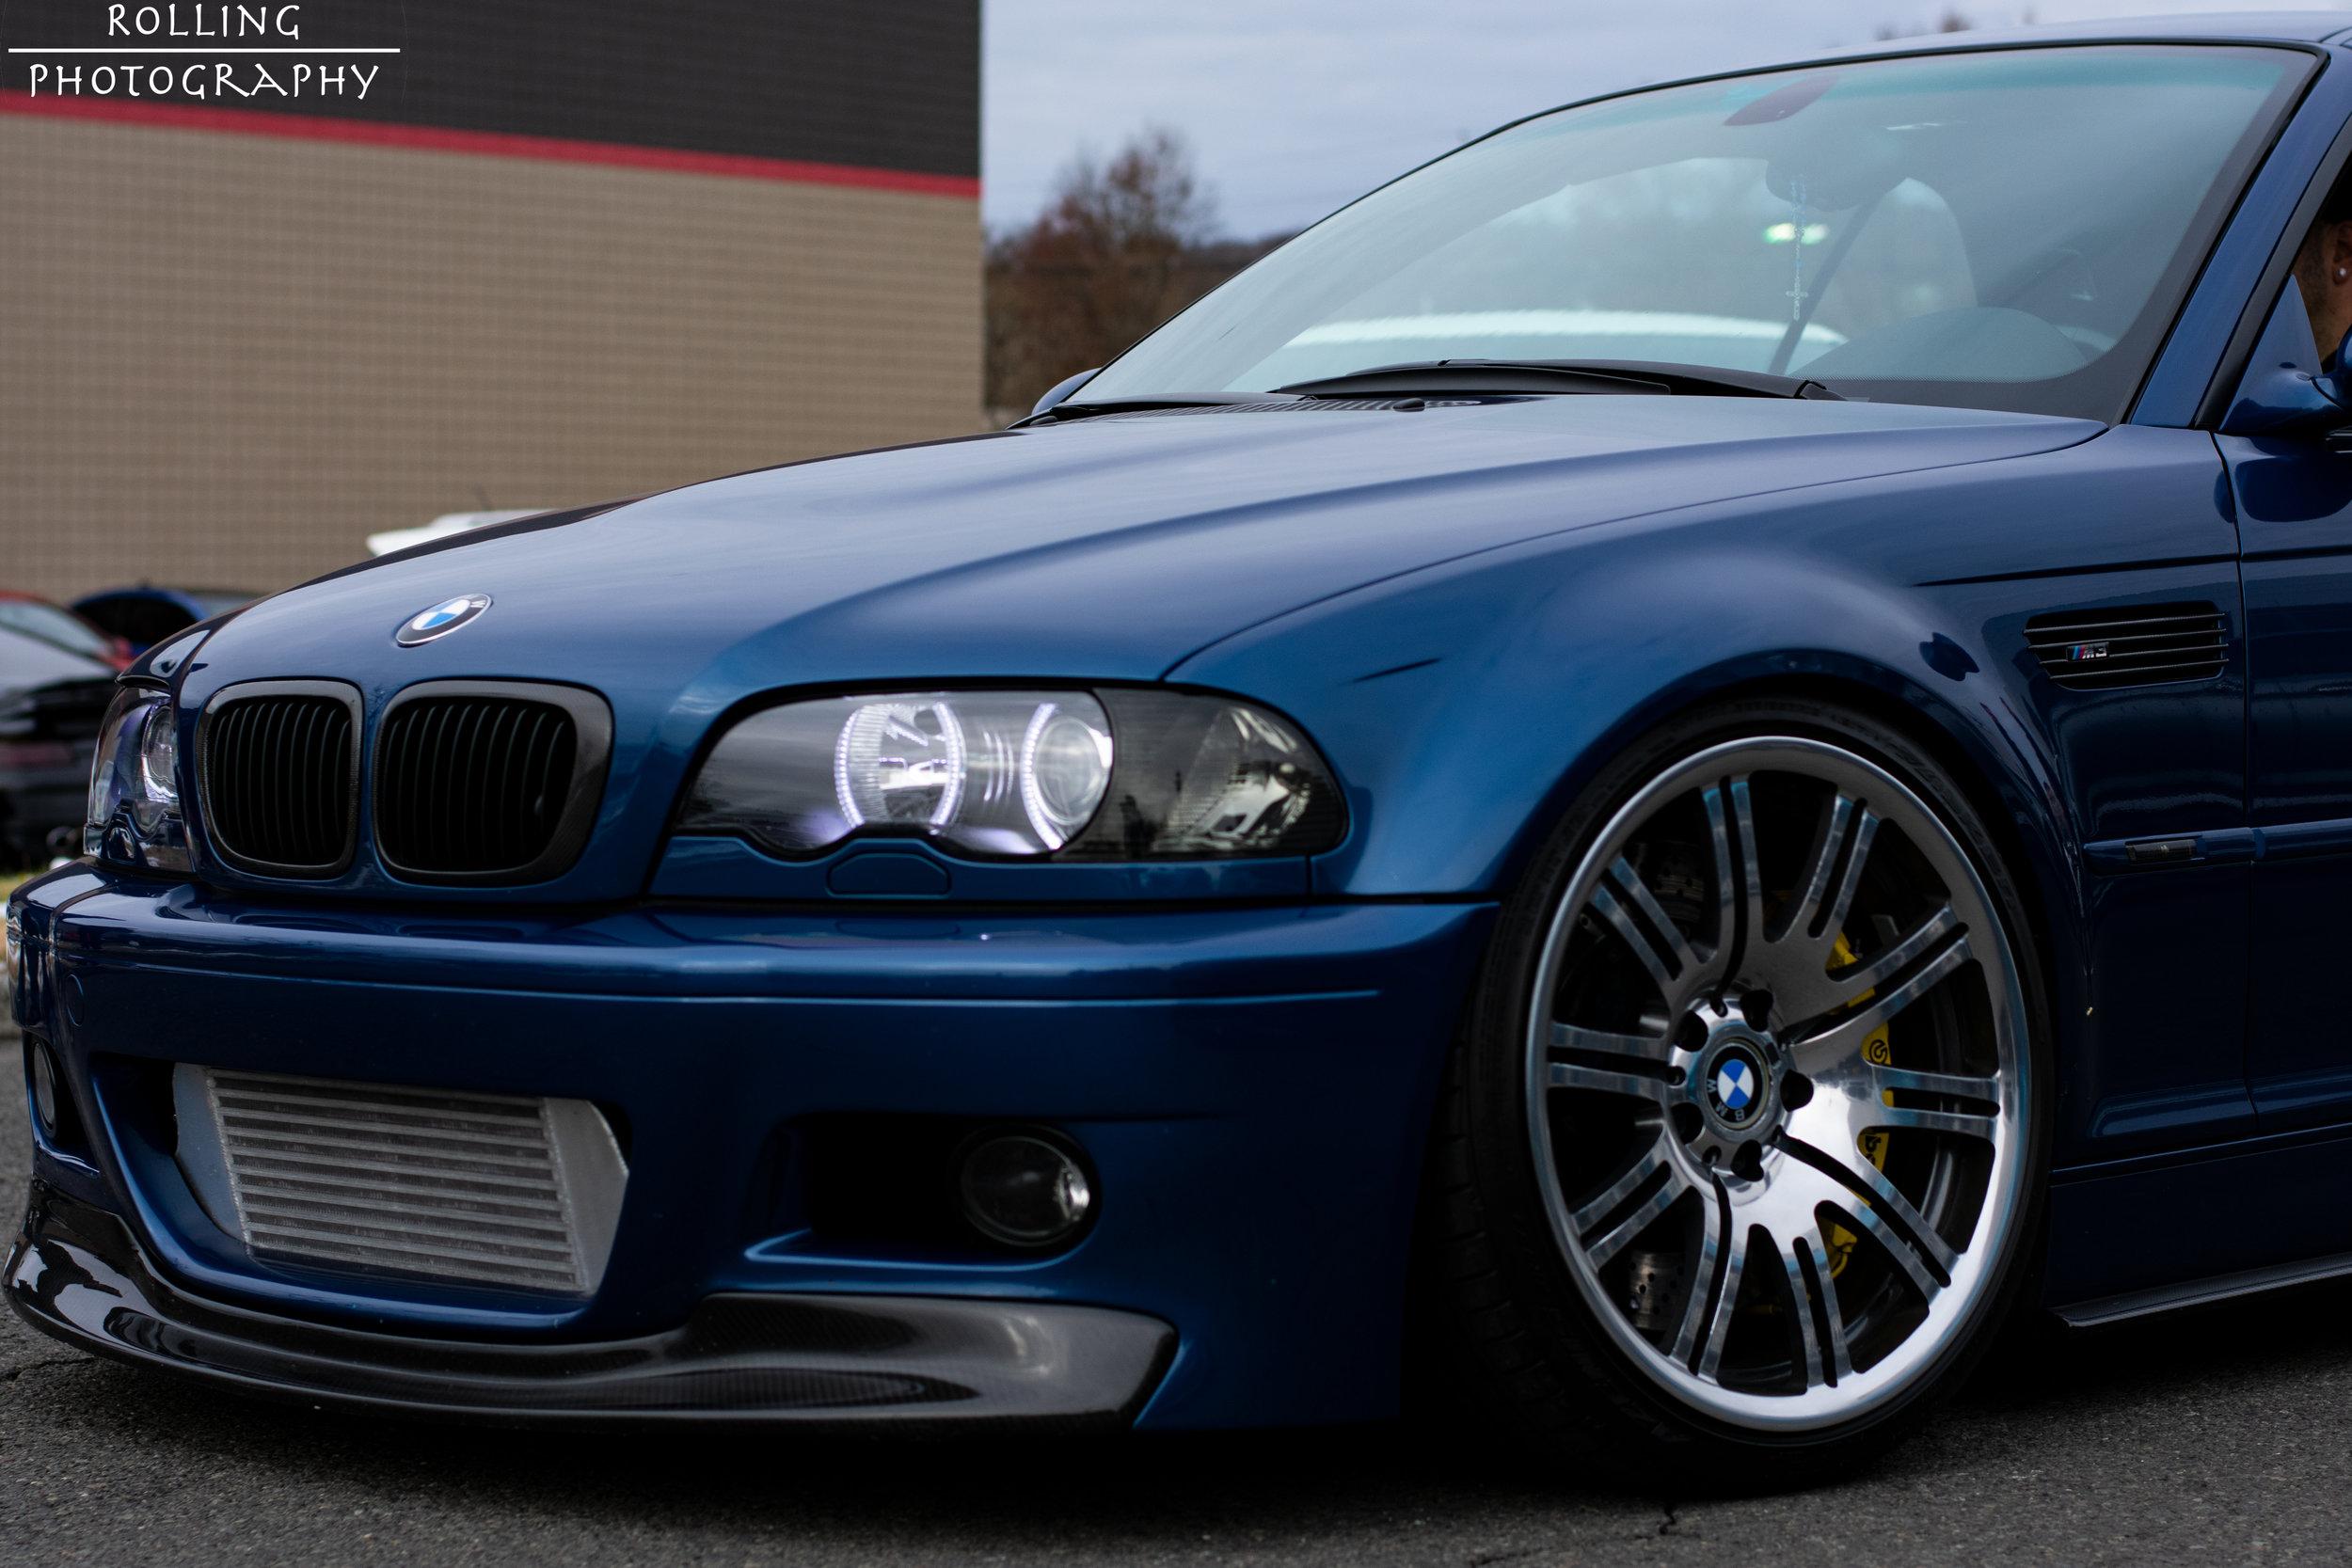 BMW M3 E46 Front Left.jpg